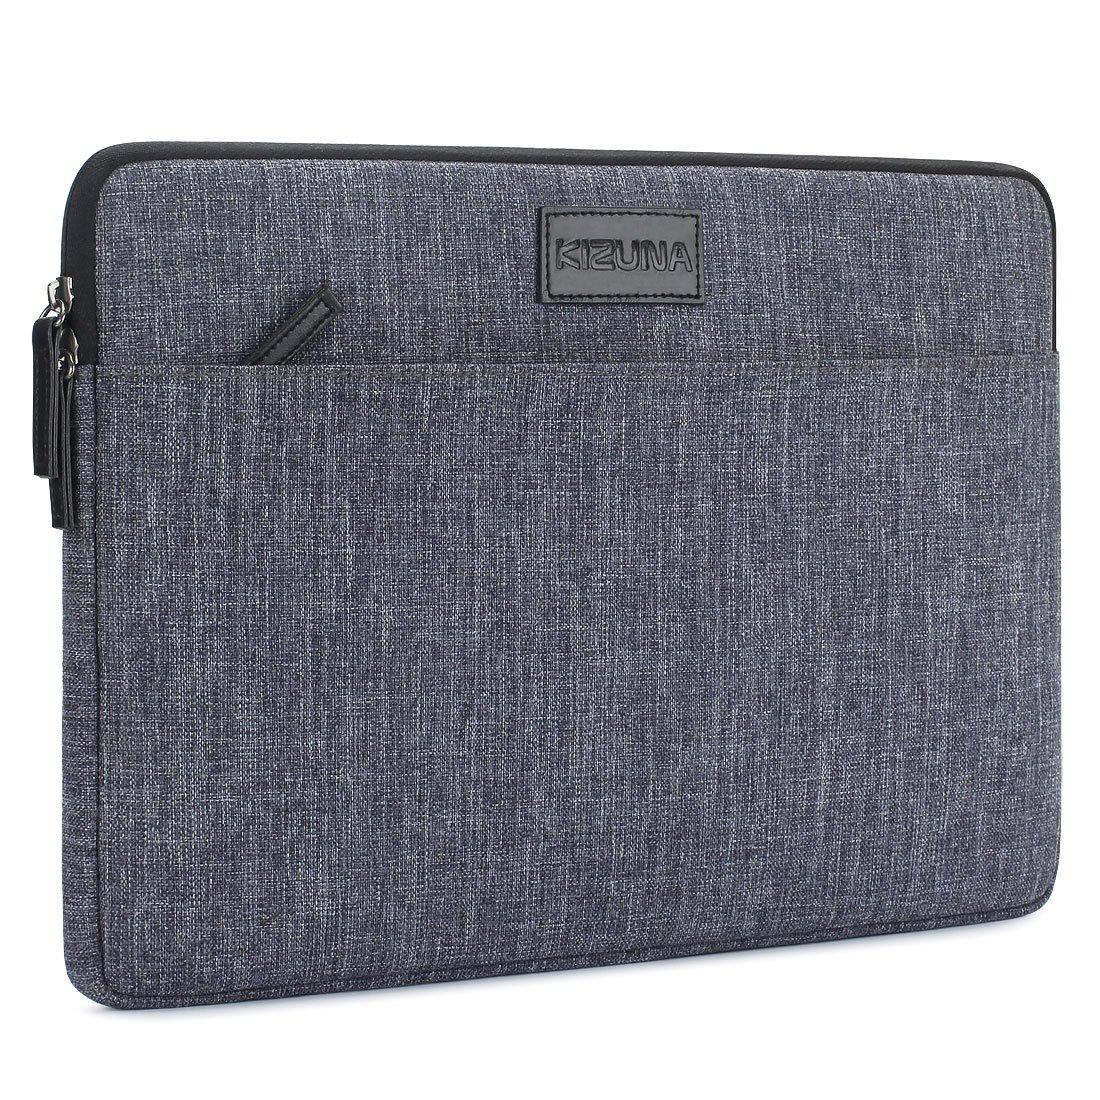 KIZUNA Laptop Sleeve 13 Inch Water-Resistant Shockproof Notebook Case Carrying Bag for 13.3'' Computer / 13'' MacBook Pro / 13.9'' HUAWEI MateBook X Pro, Grey